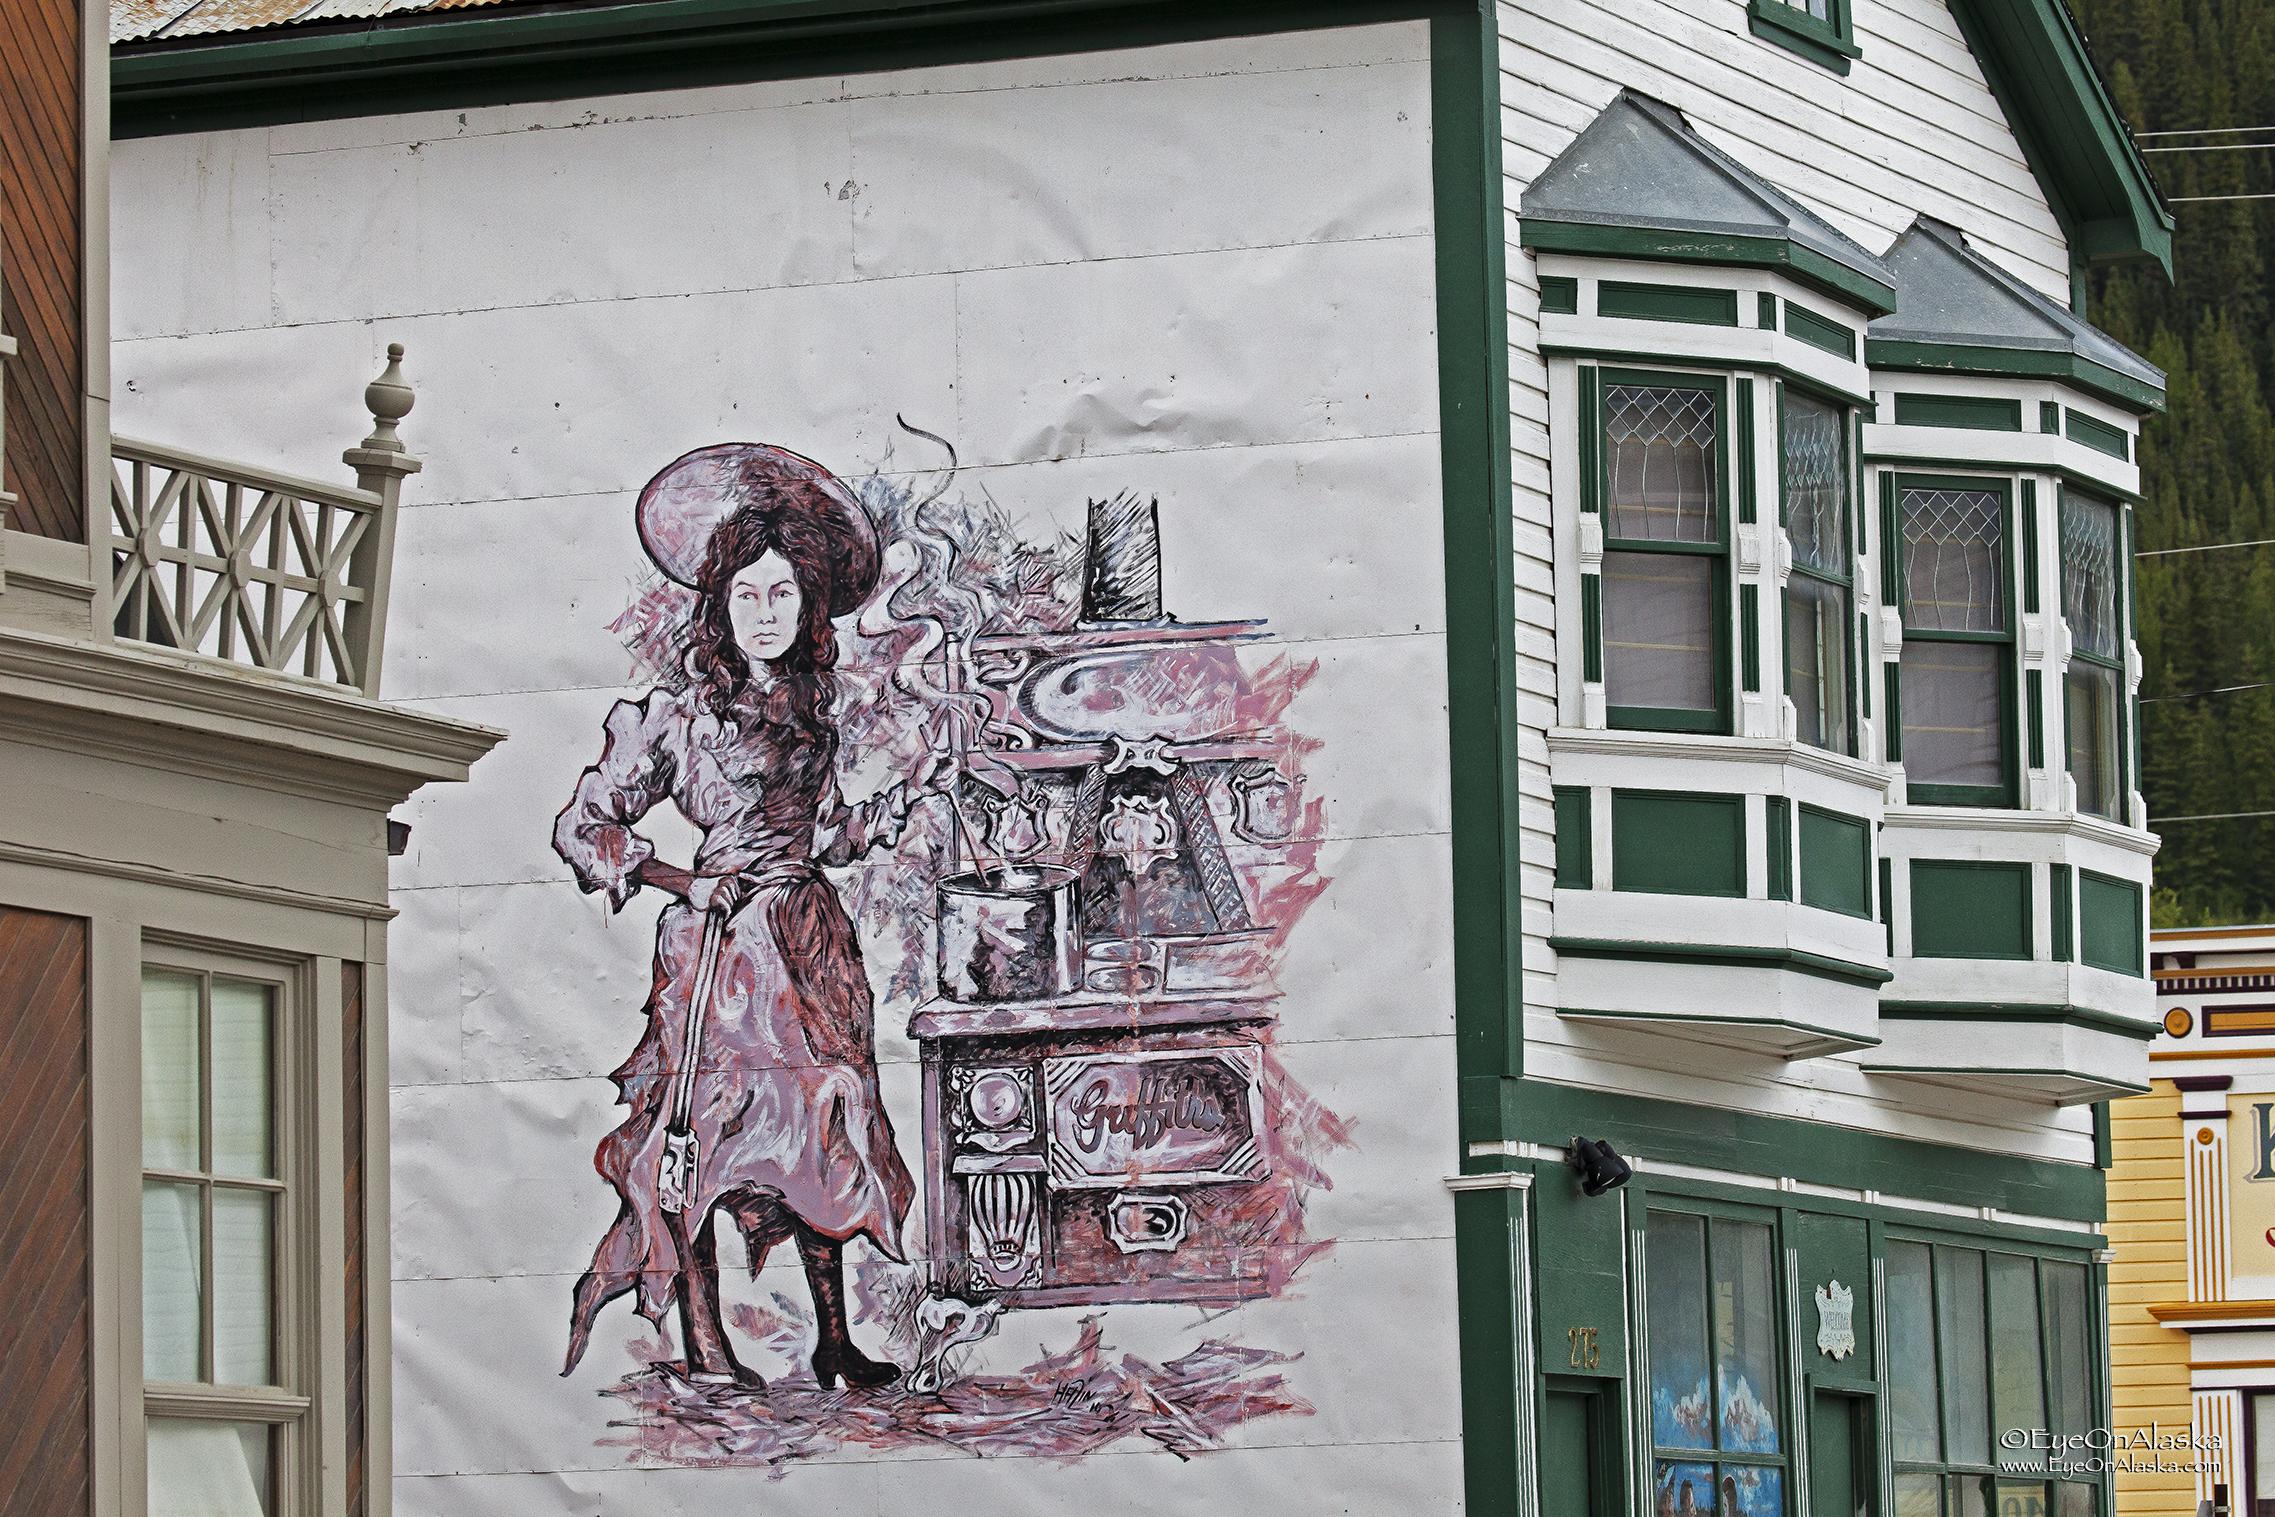 Downtown art.